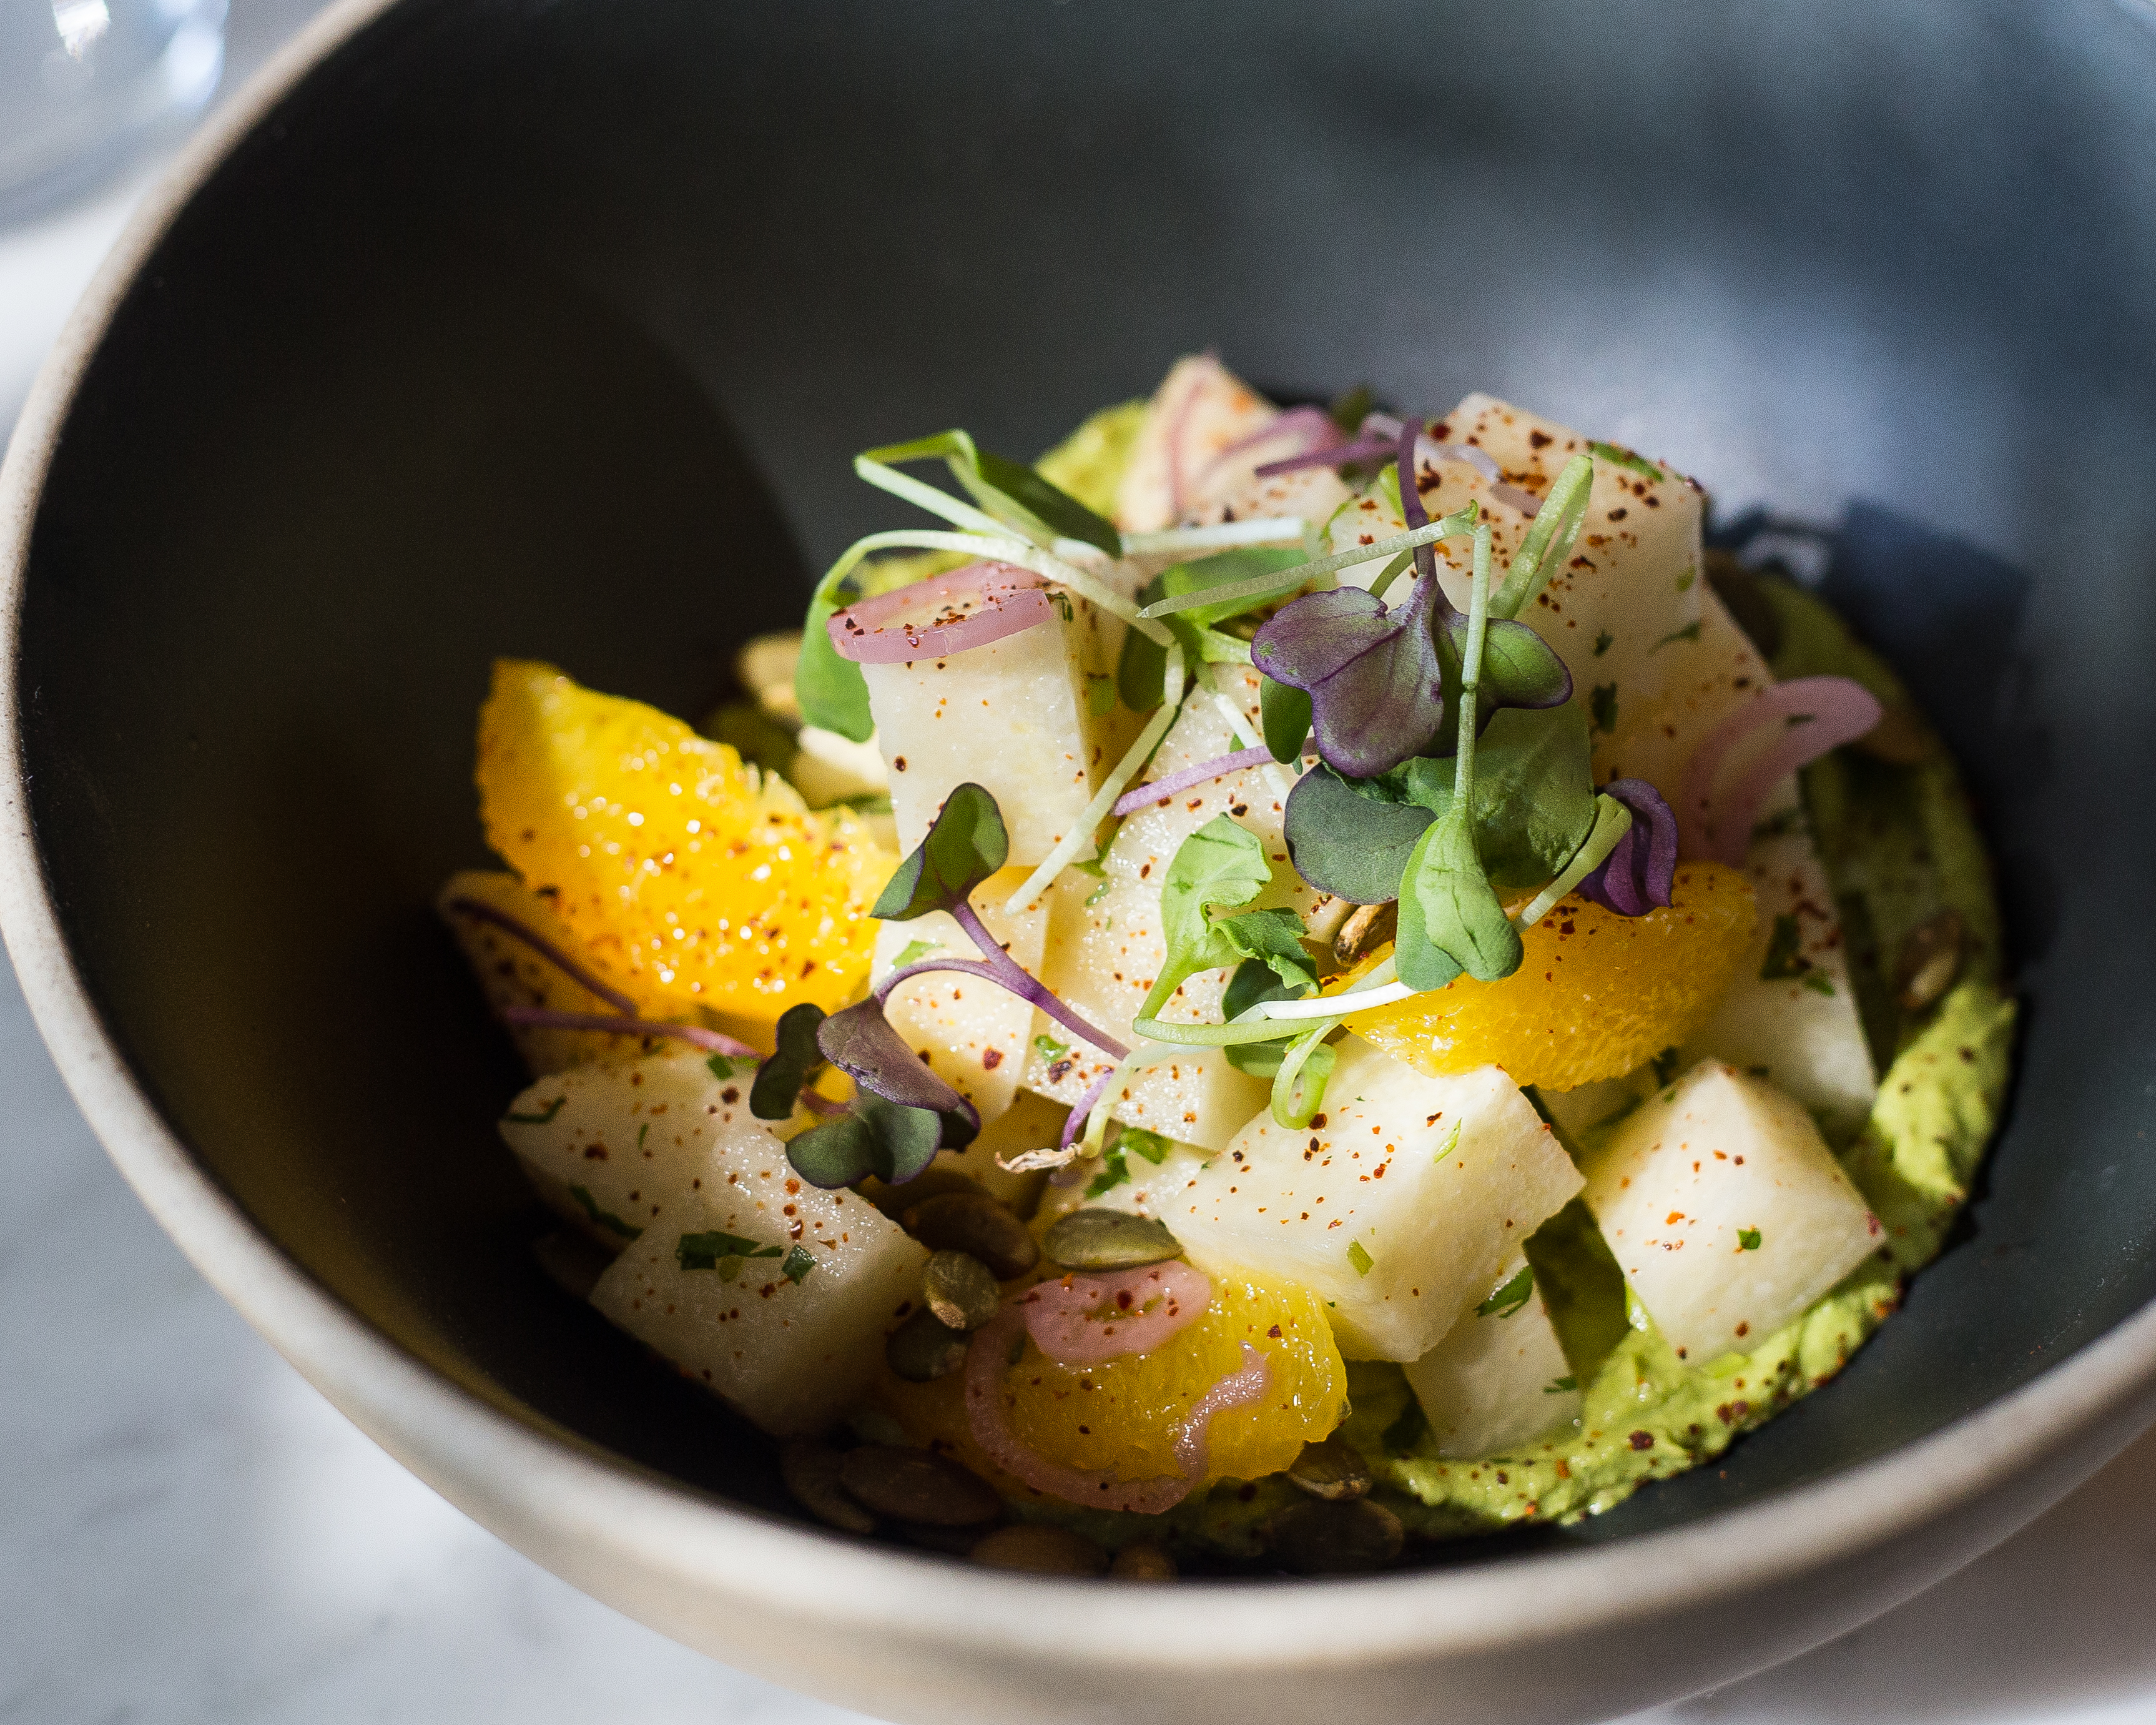 Delicious salad at Rosalinda restaurant Toronto